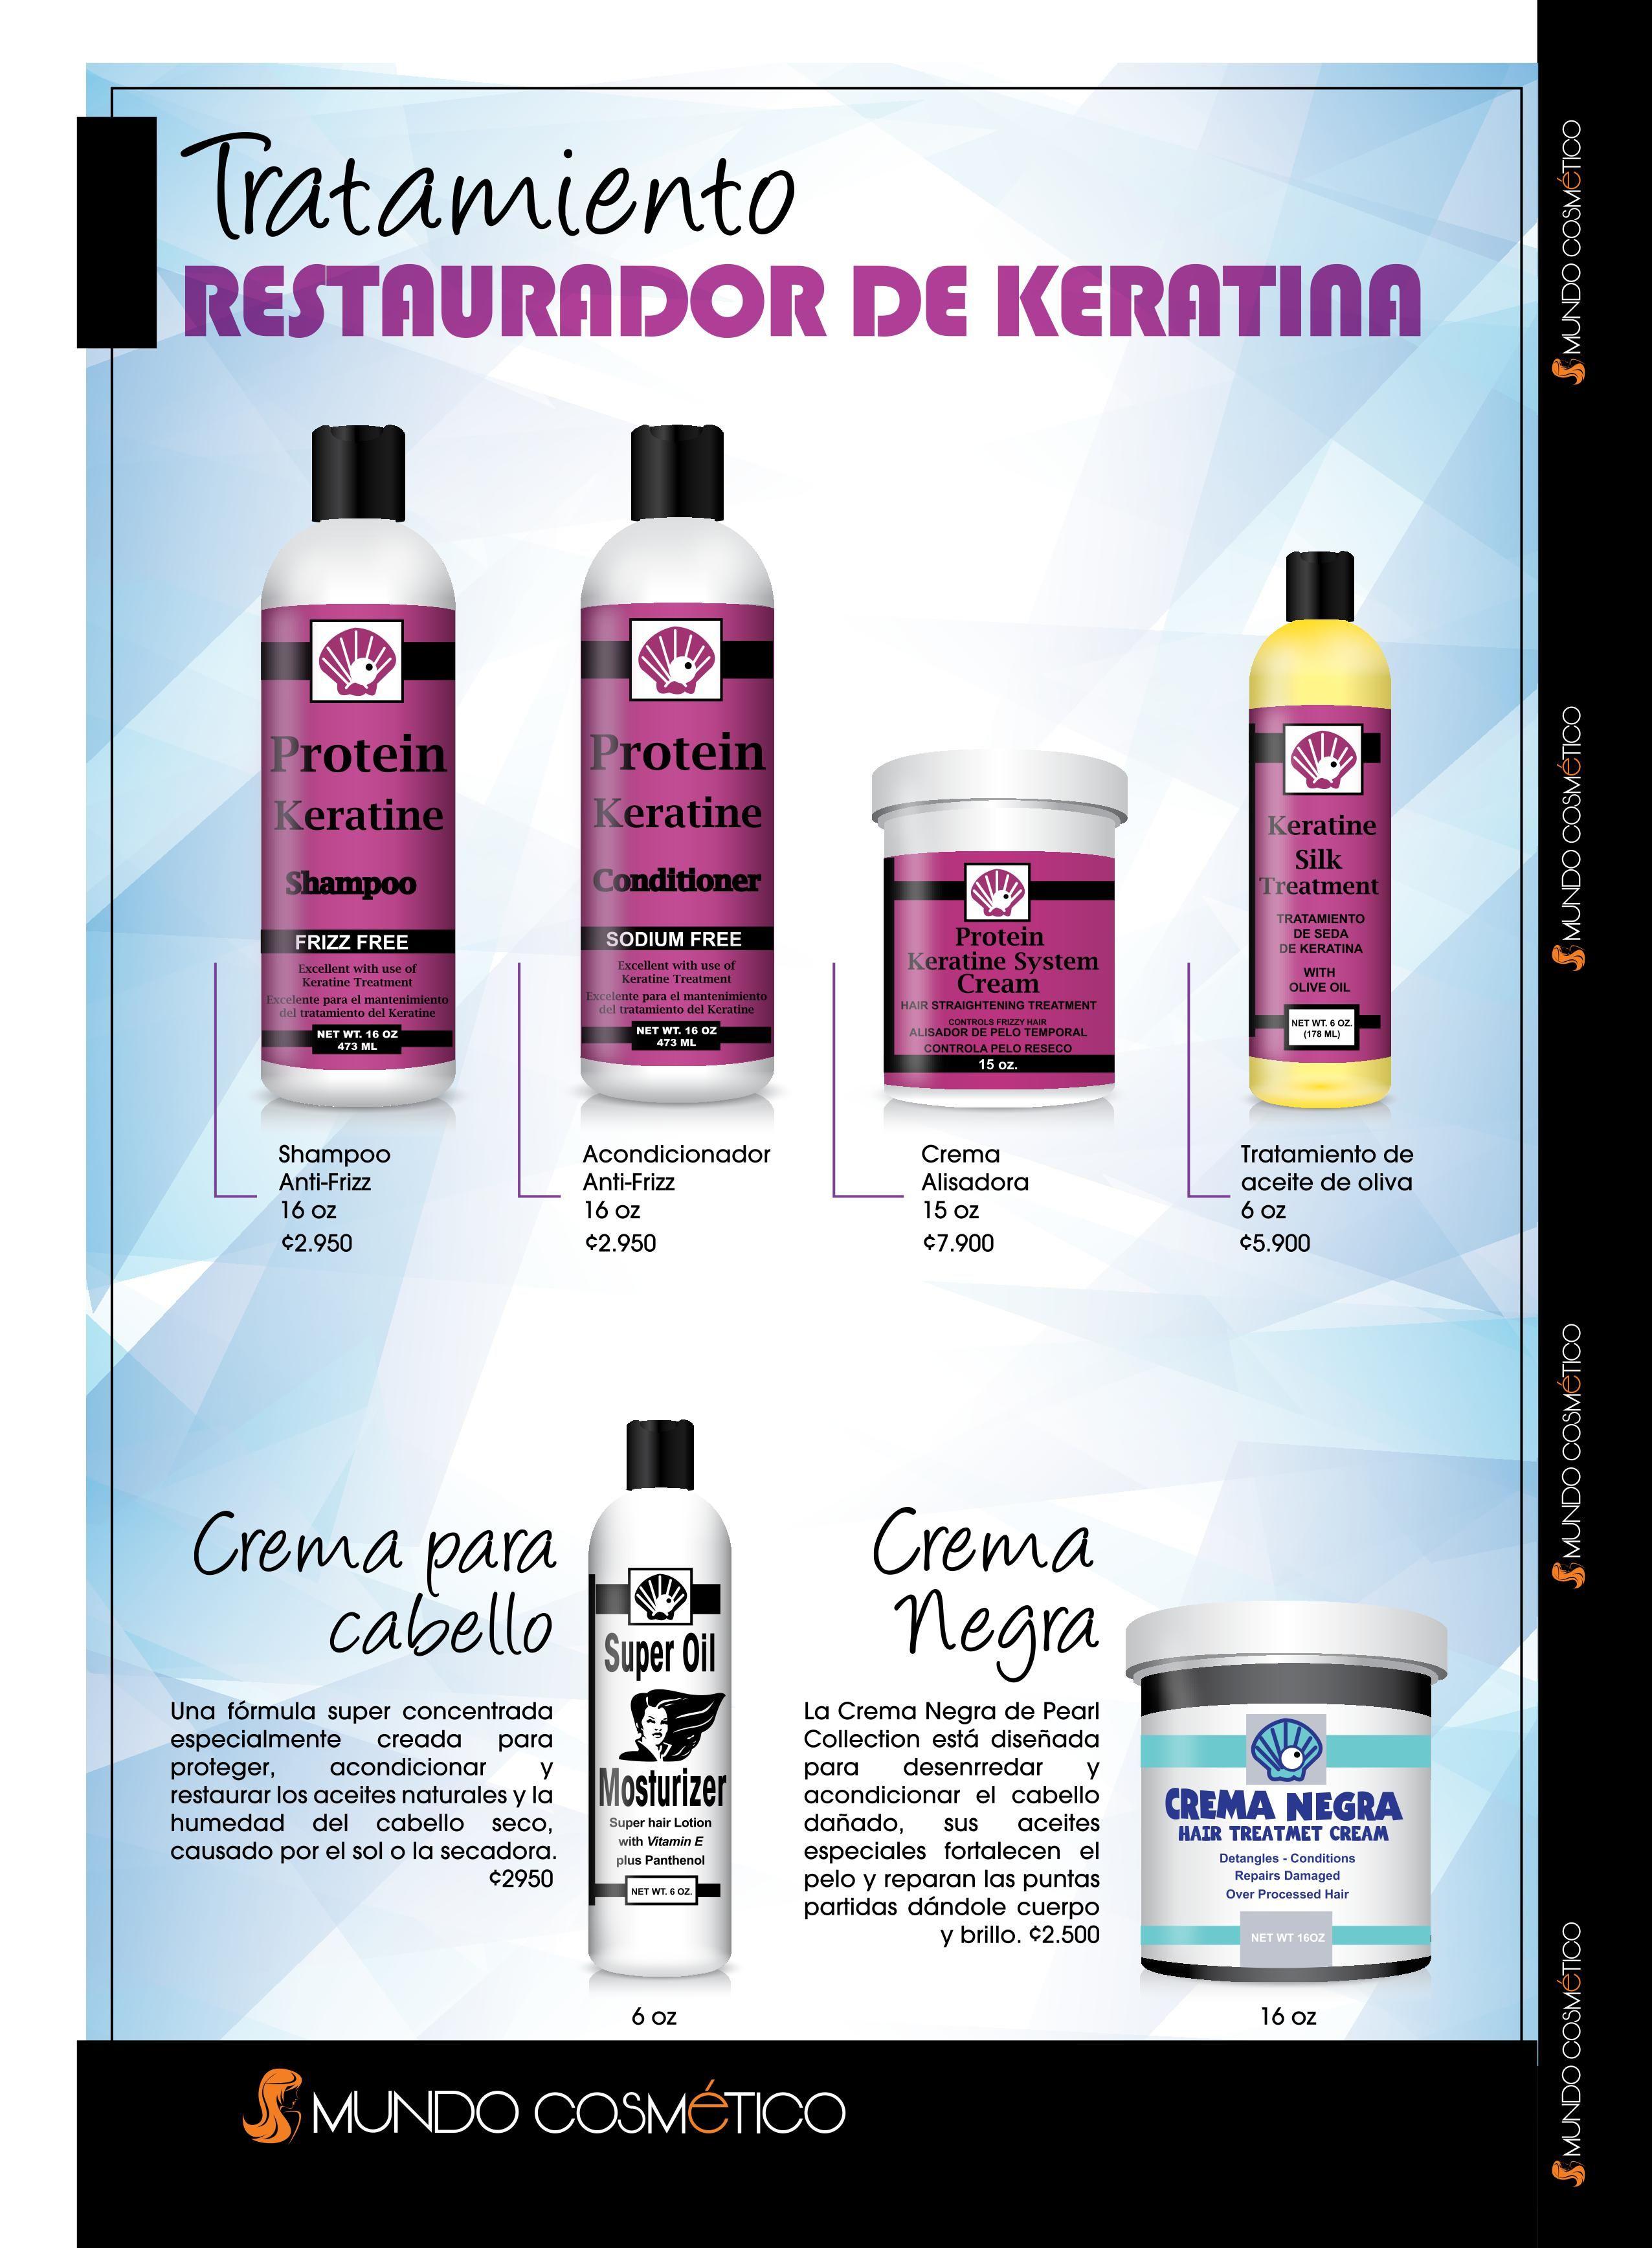 Tratamiento Restaurador de Keratina.